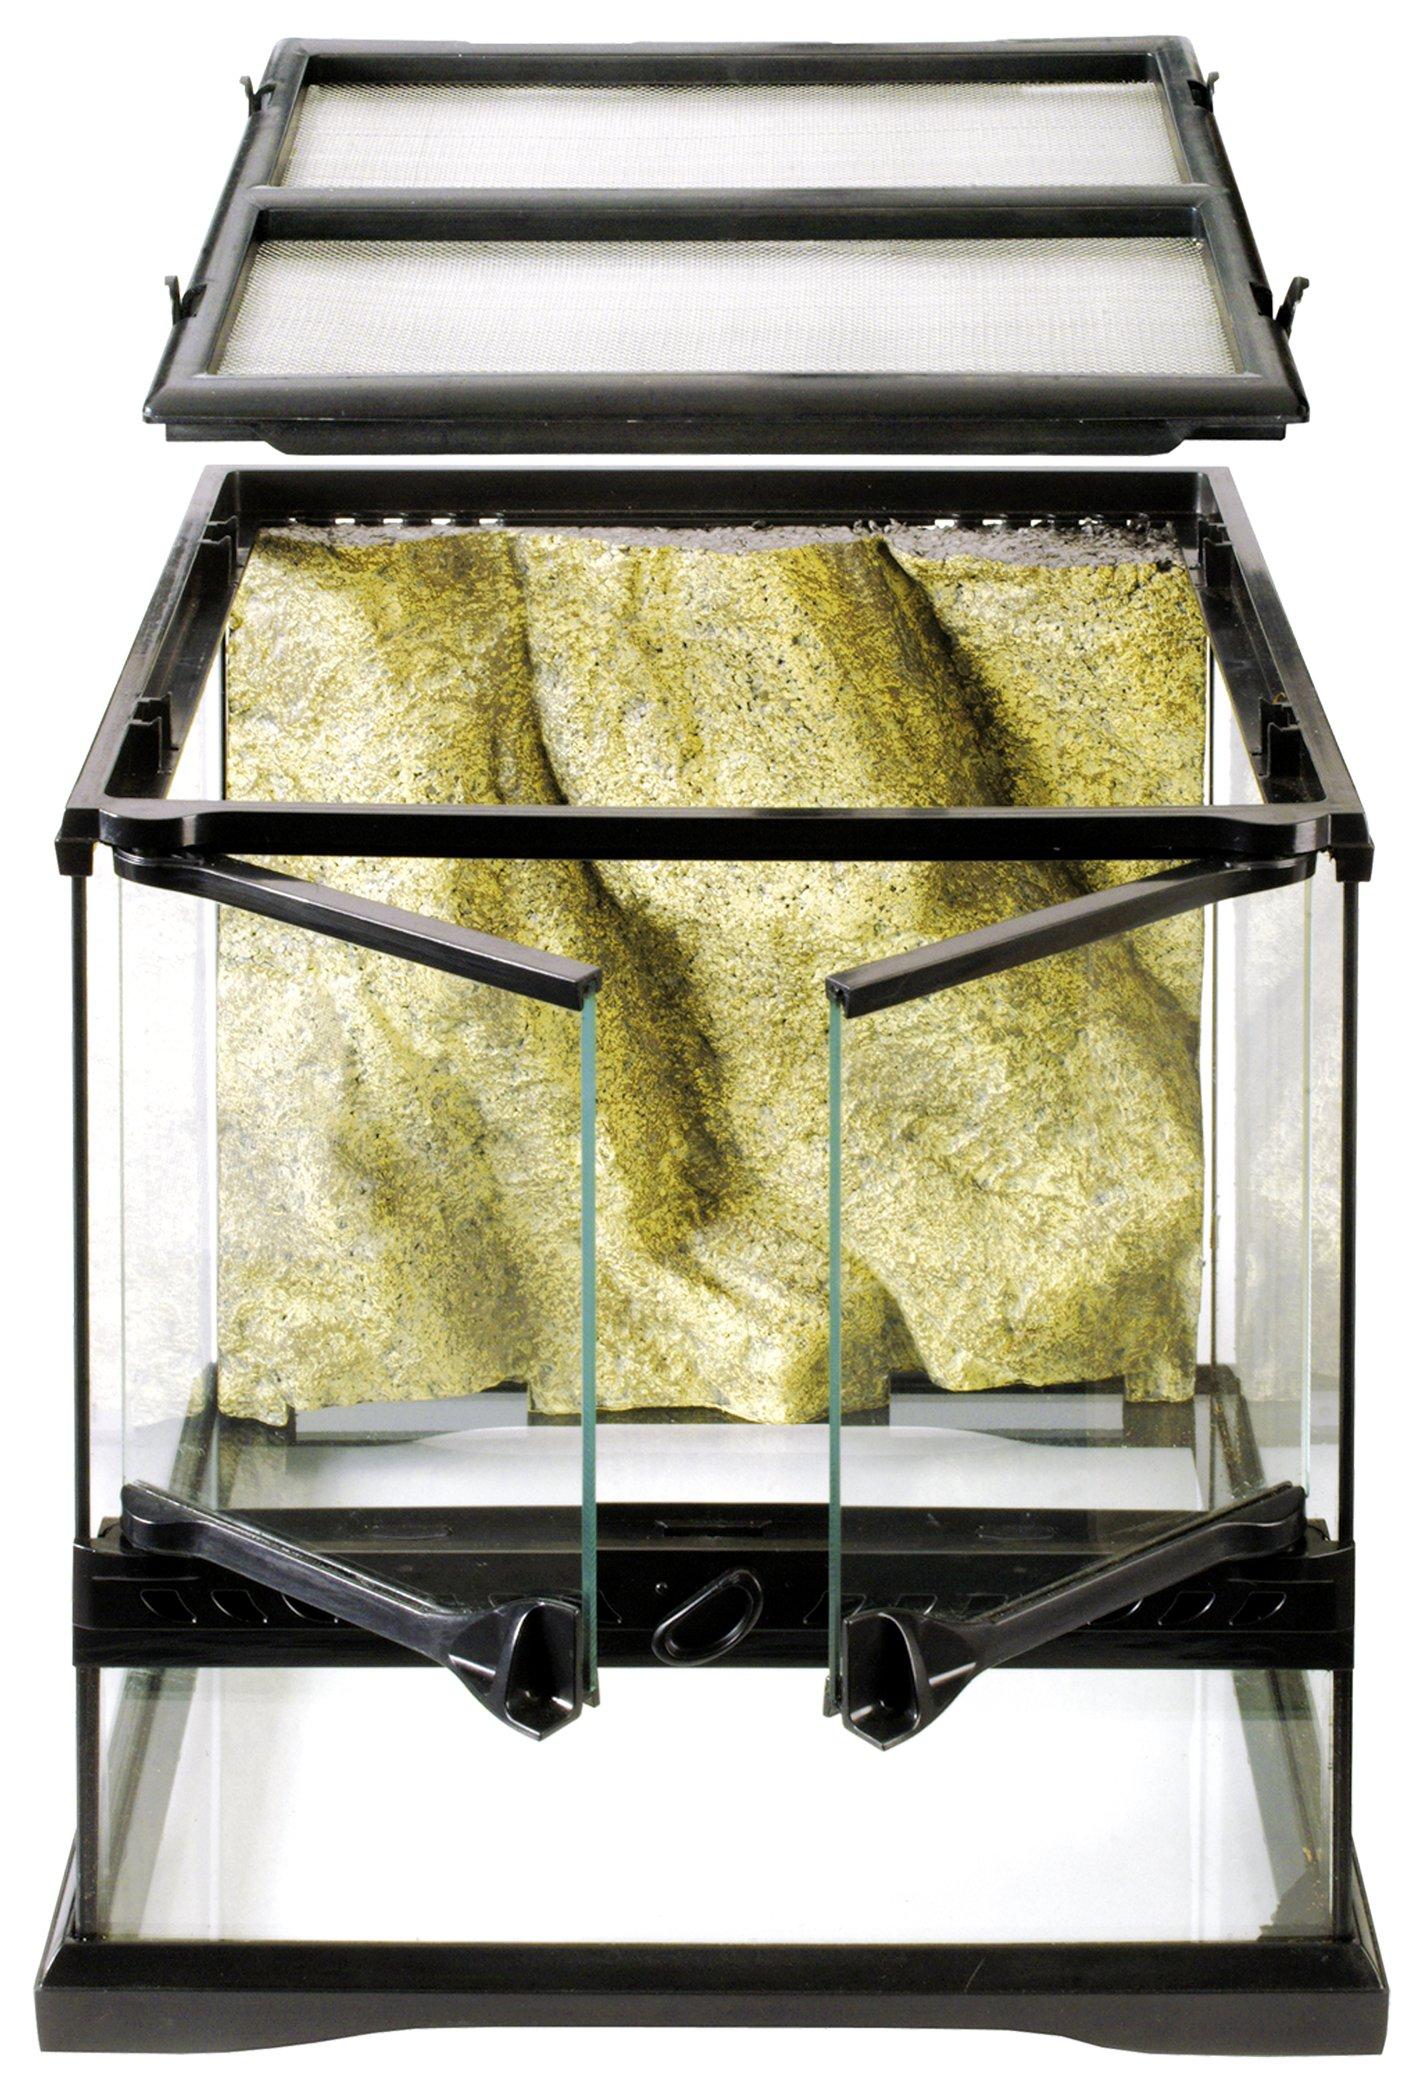 Exo Terra Glass Reptile Terrarium, 12 by 12 by 12 inch by Hagen